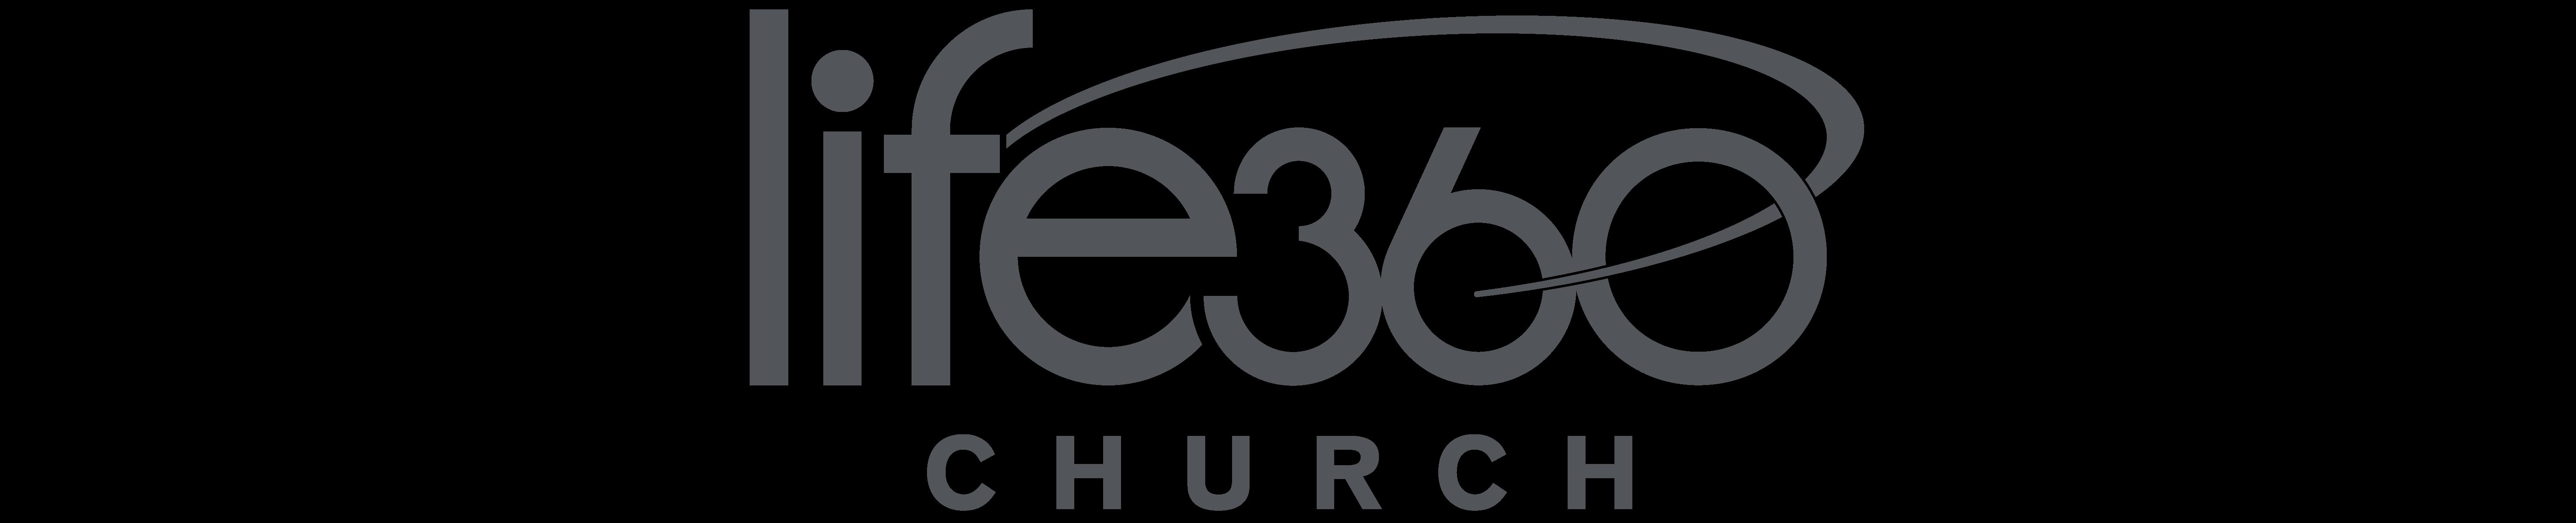 Life360 Church